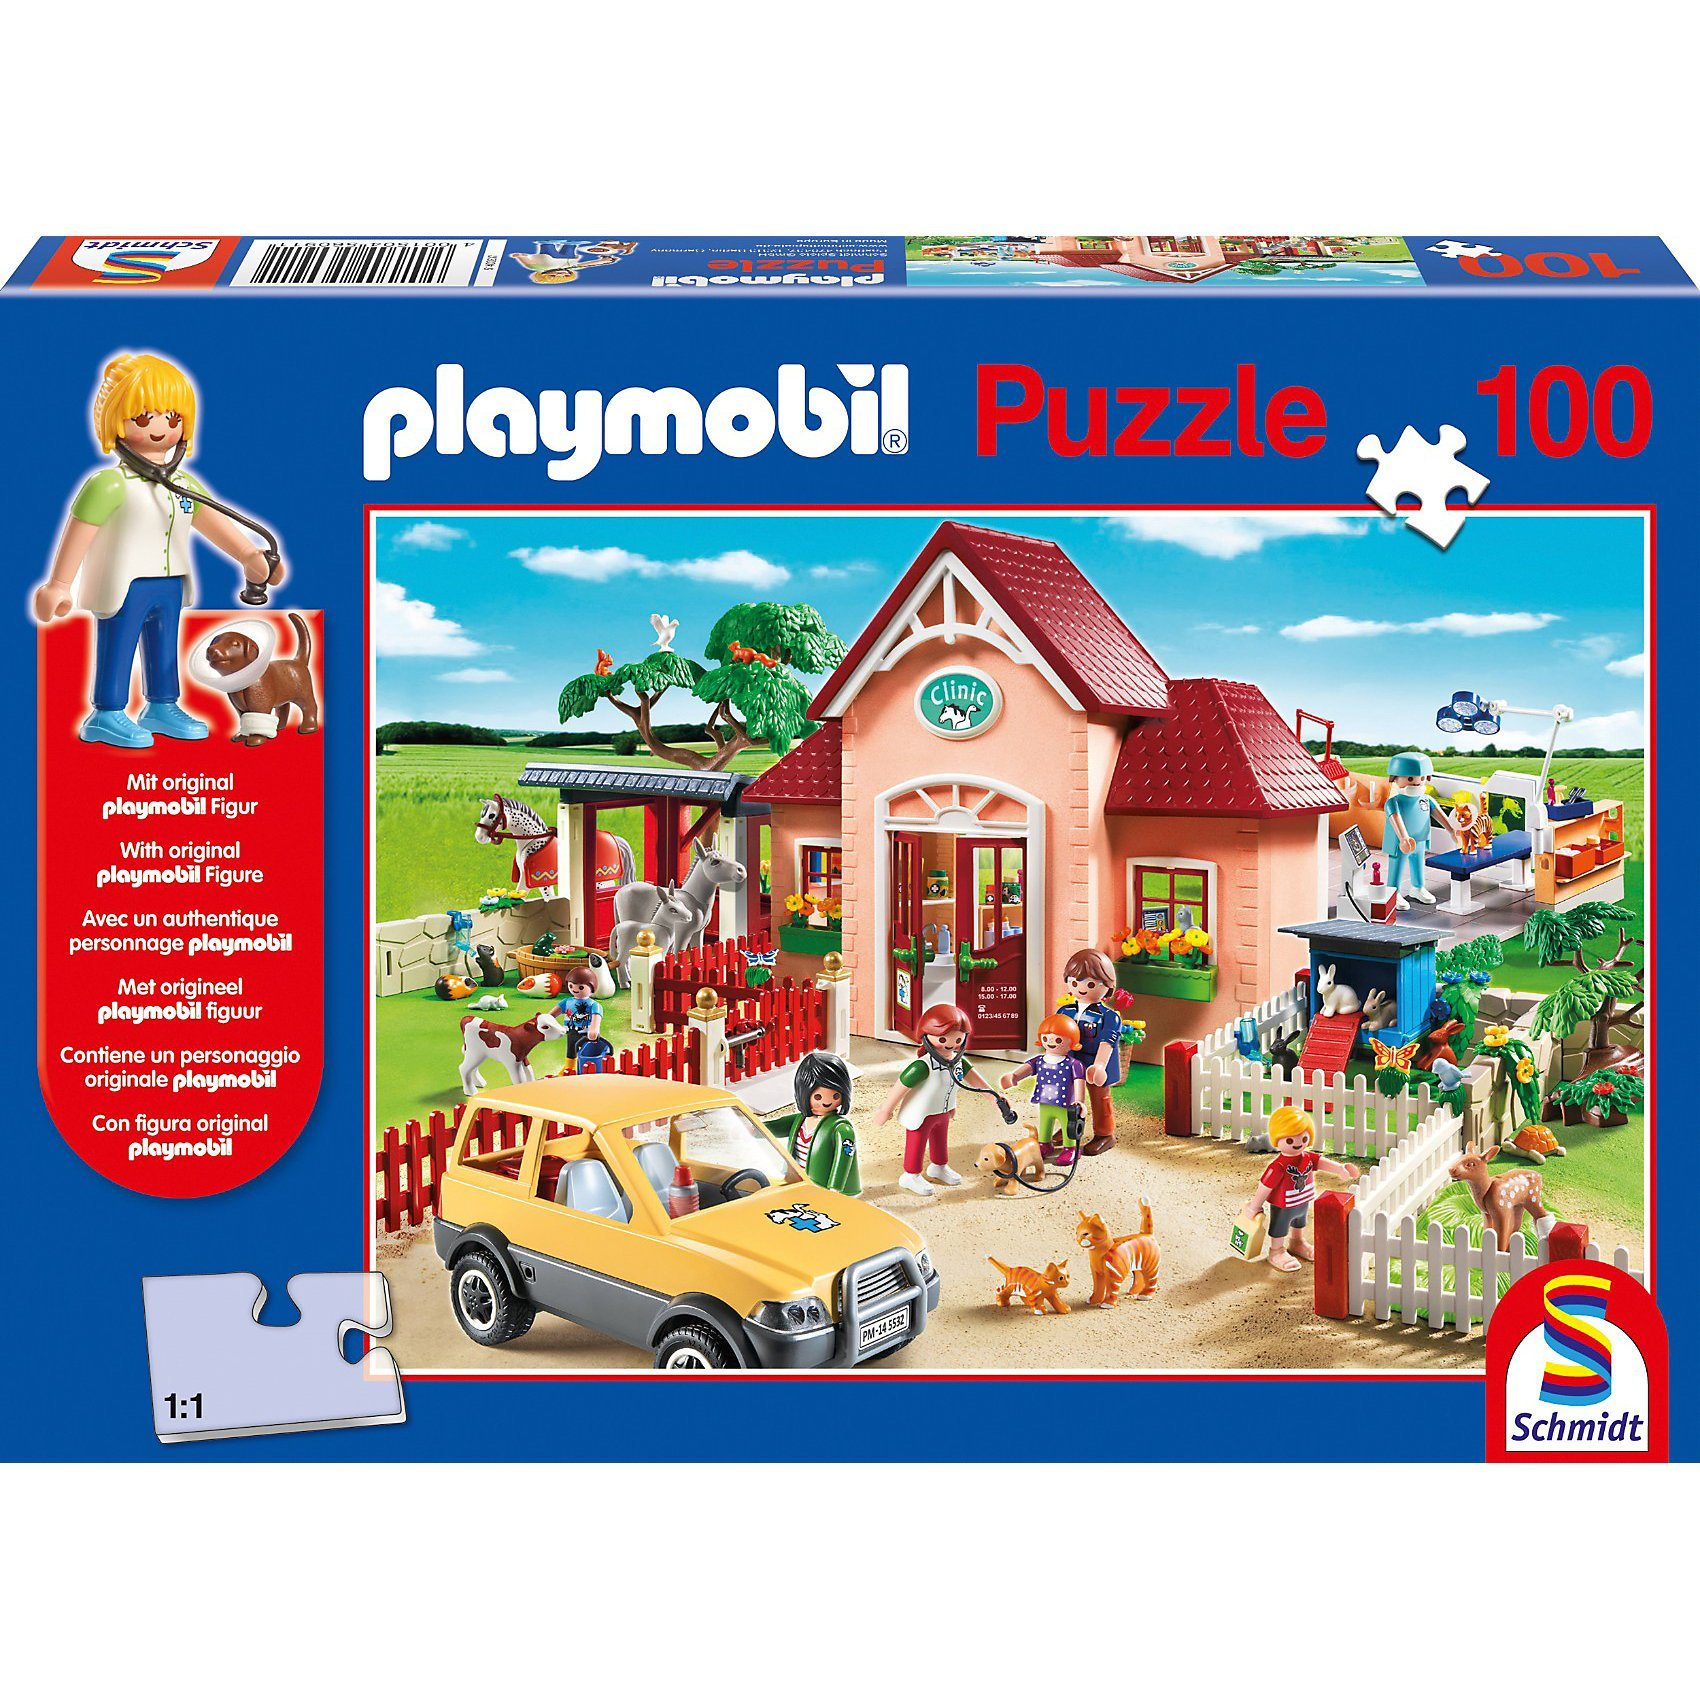 Schmidt Spiele Playmobil, Tierarztpraxis, 100 Teile, mit Original Figur